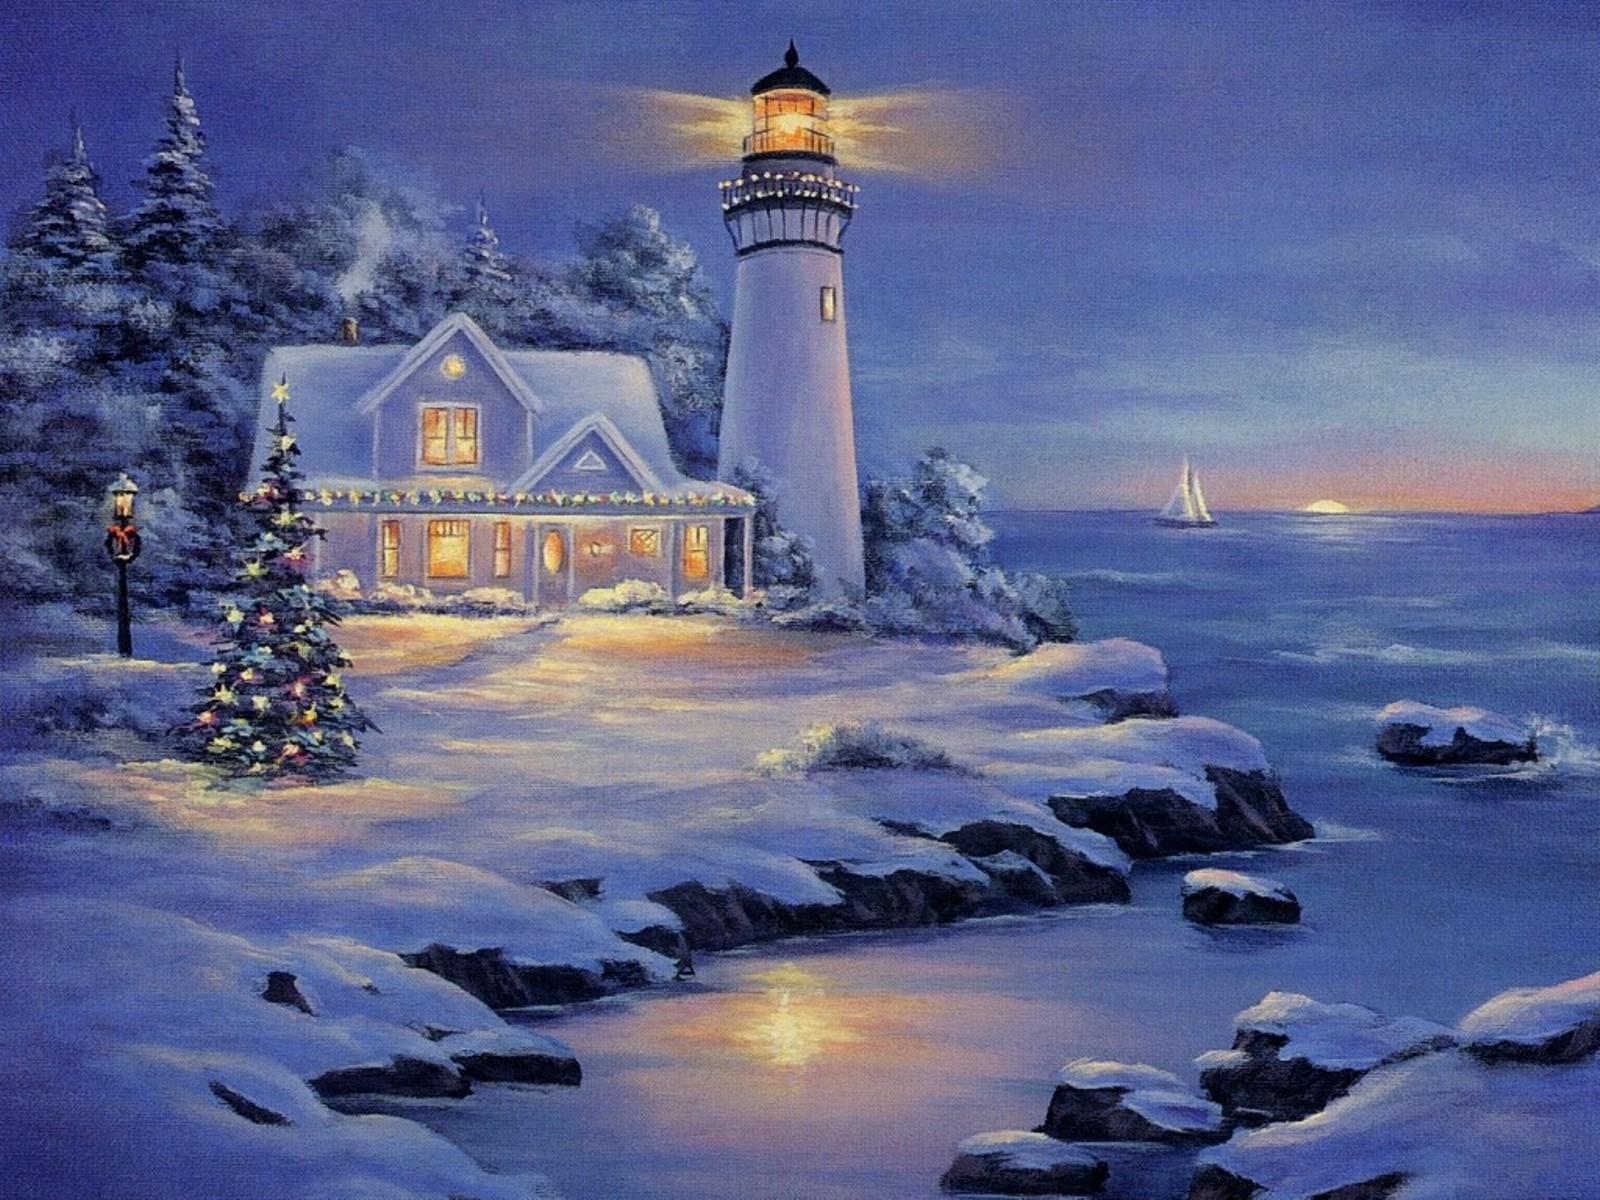 http://1.bp.blogspot.com/-siUNA--yI4s/Tkzo8SkGVaI/AAAAAAAAA2k/R-Cq2Ip_SFM/s1600/Winter+Scenery+%252850%2529.jpg